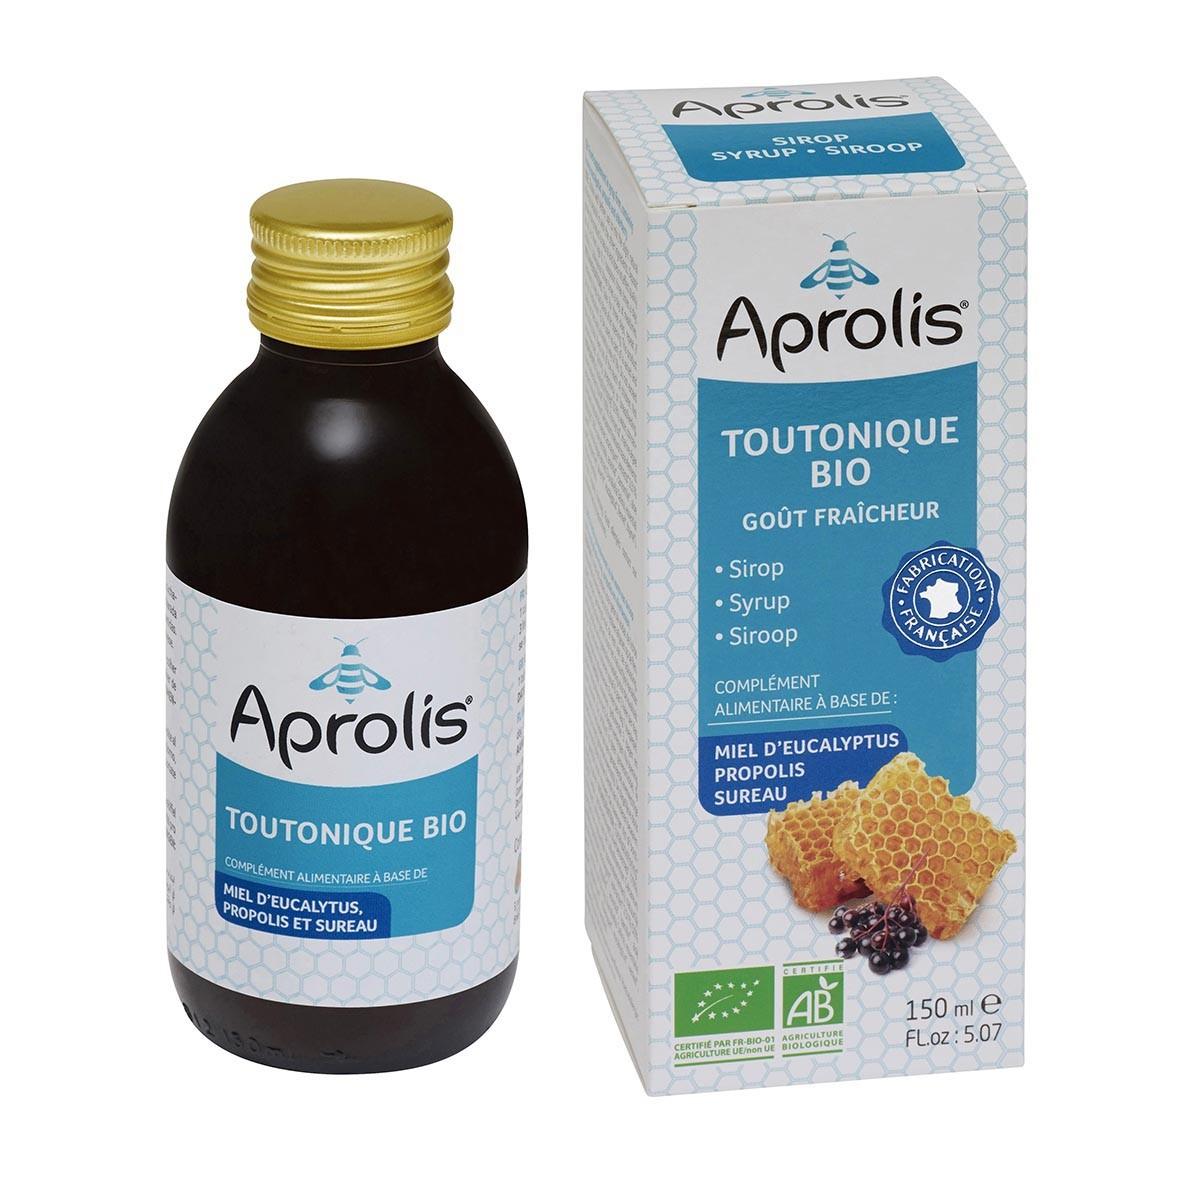 Aprolis - Toutonique 150ml Bio